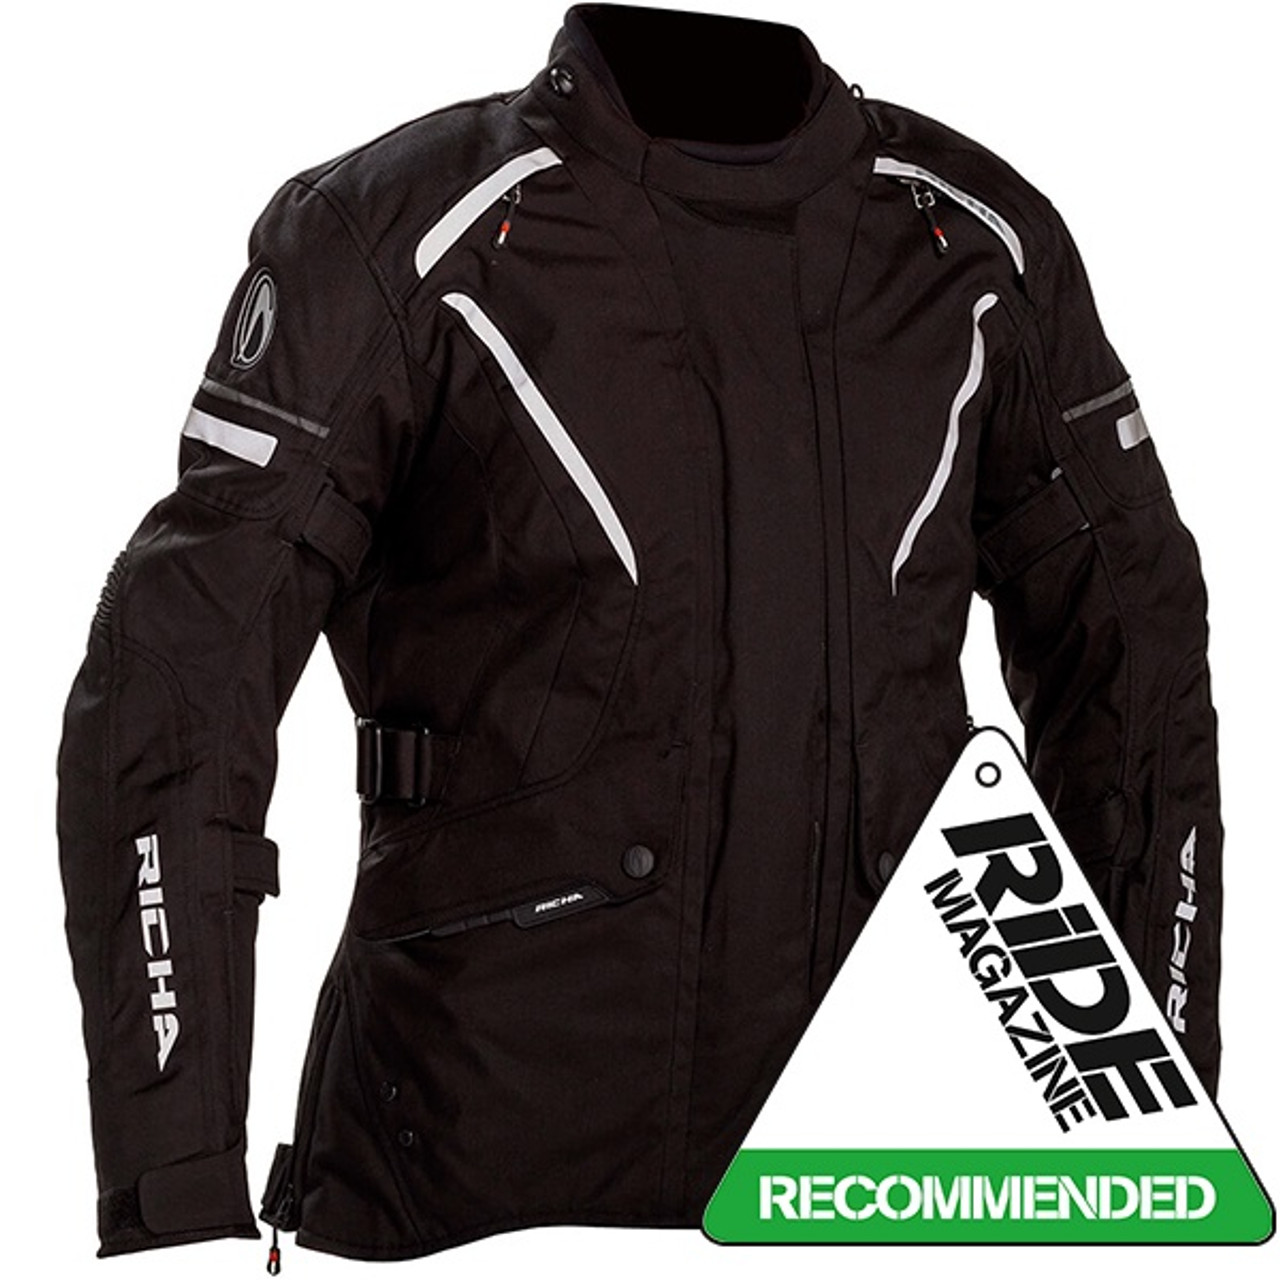 Richa Cyclone Goretex Ladies Jacket - BlackRicha Cyclone Goretex Ladies Jacket - Black